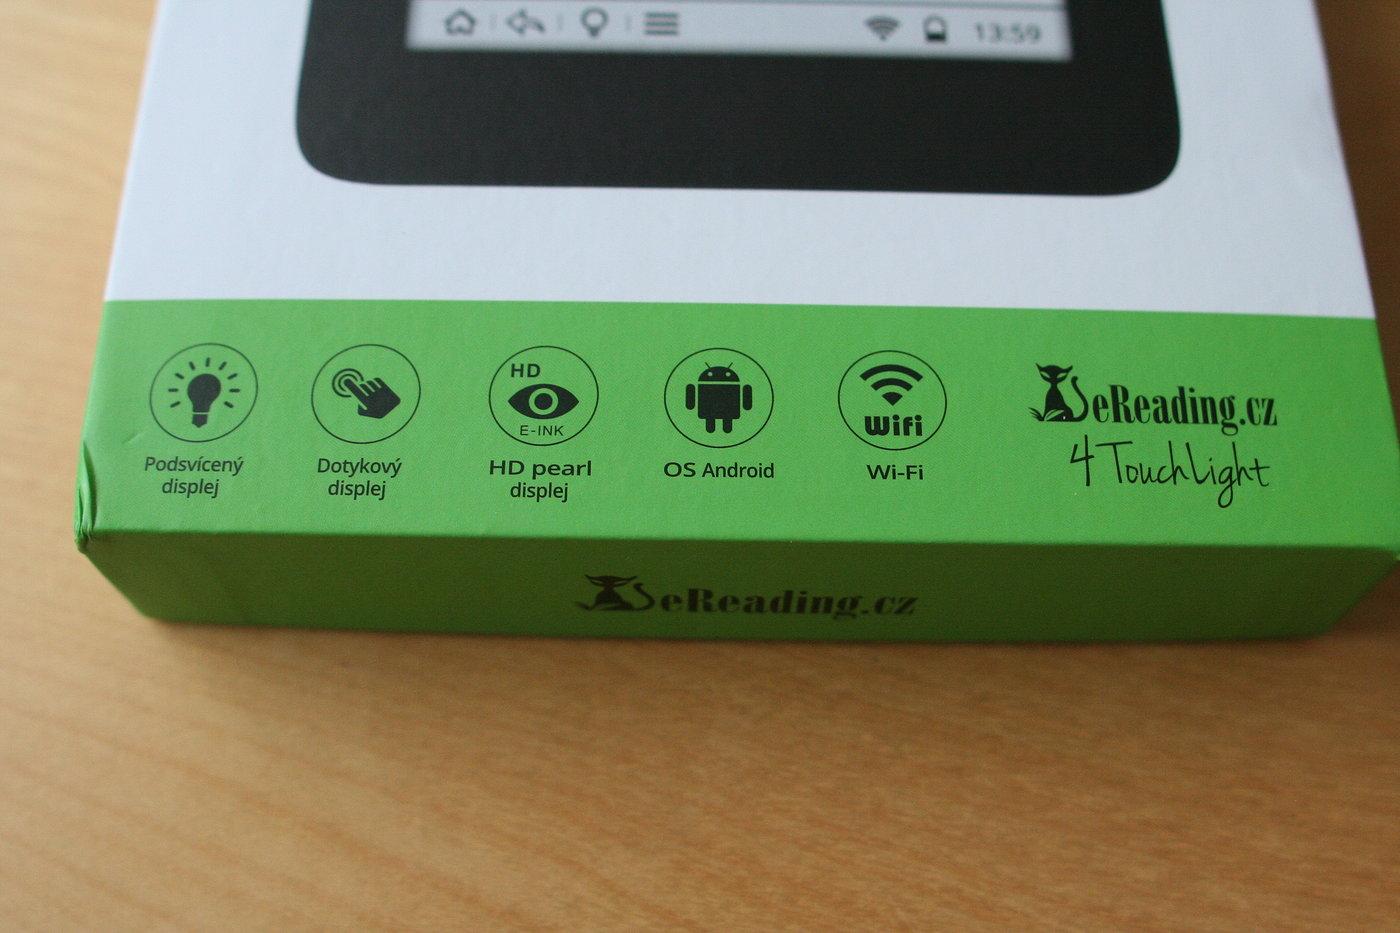 eReading.cz 4 Touch Light